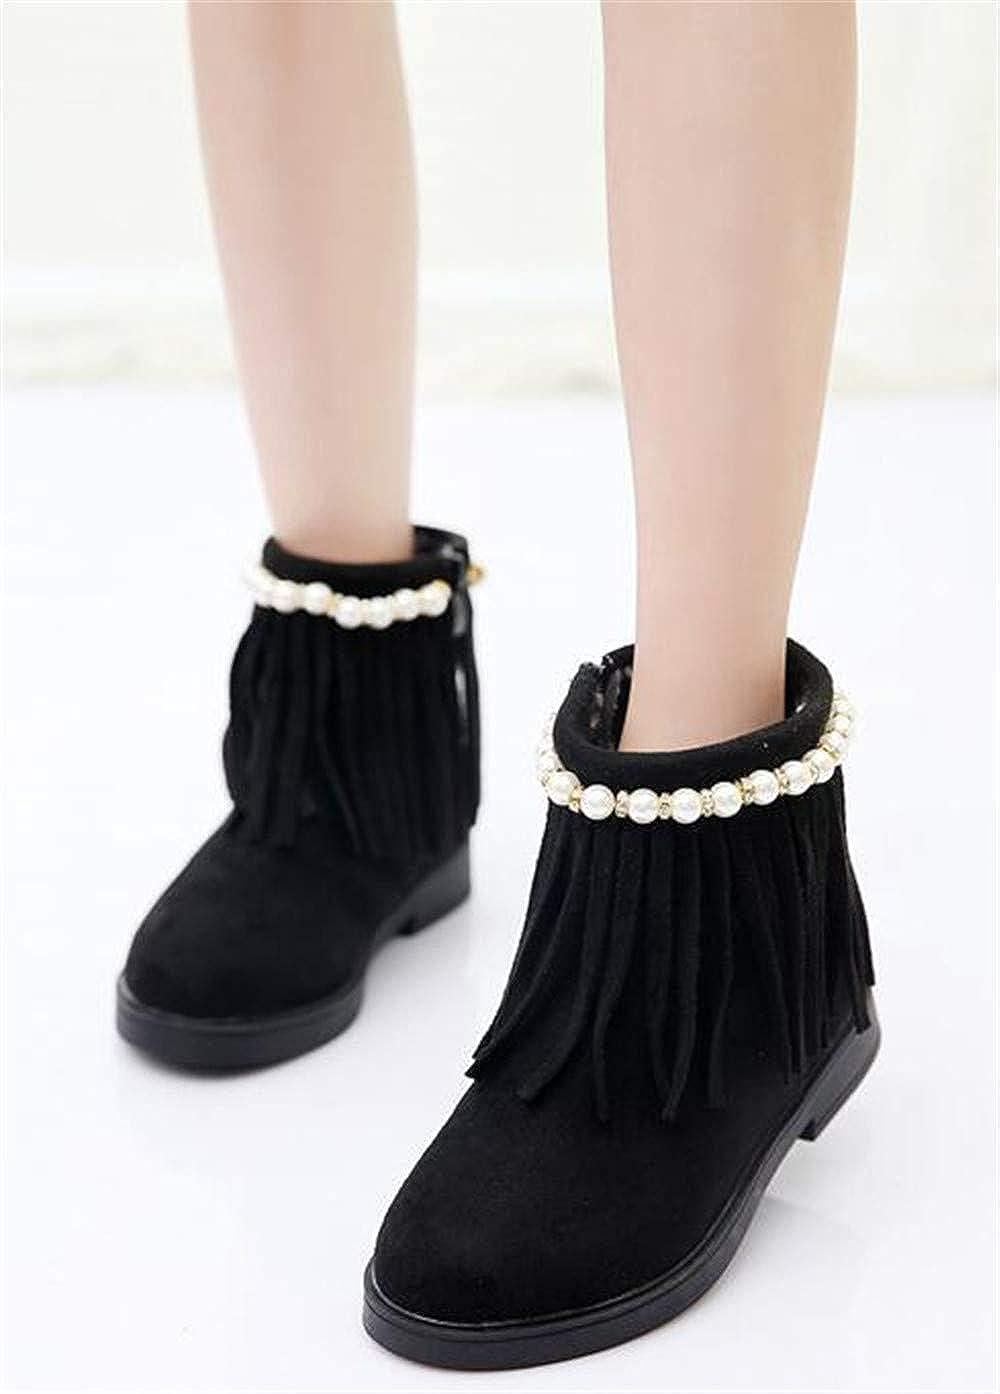 BeautyOriginal Girls Boots Ankle Fashion Boots Explore Shoes